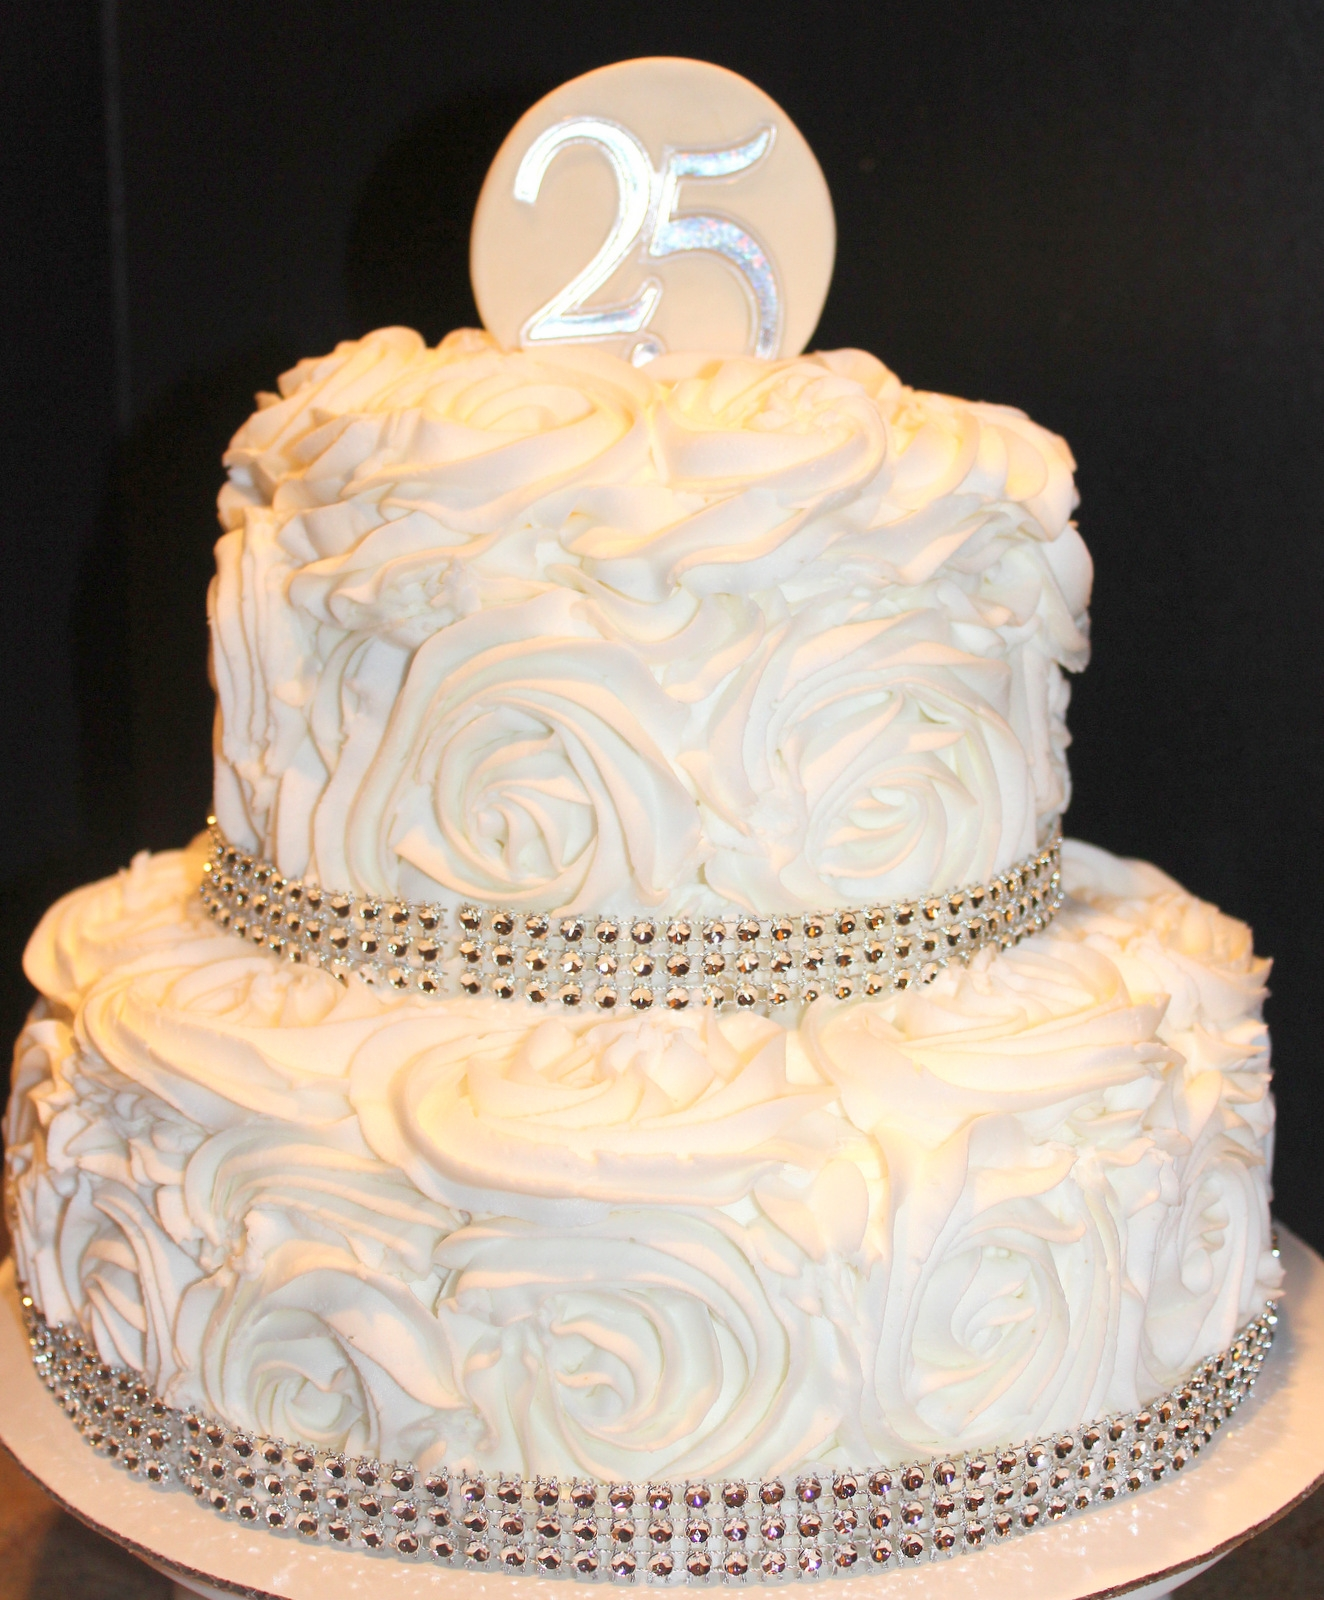 25th Wedding Anniversary Rosette Cake Cakecentral Com